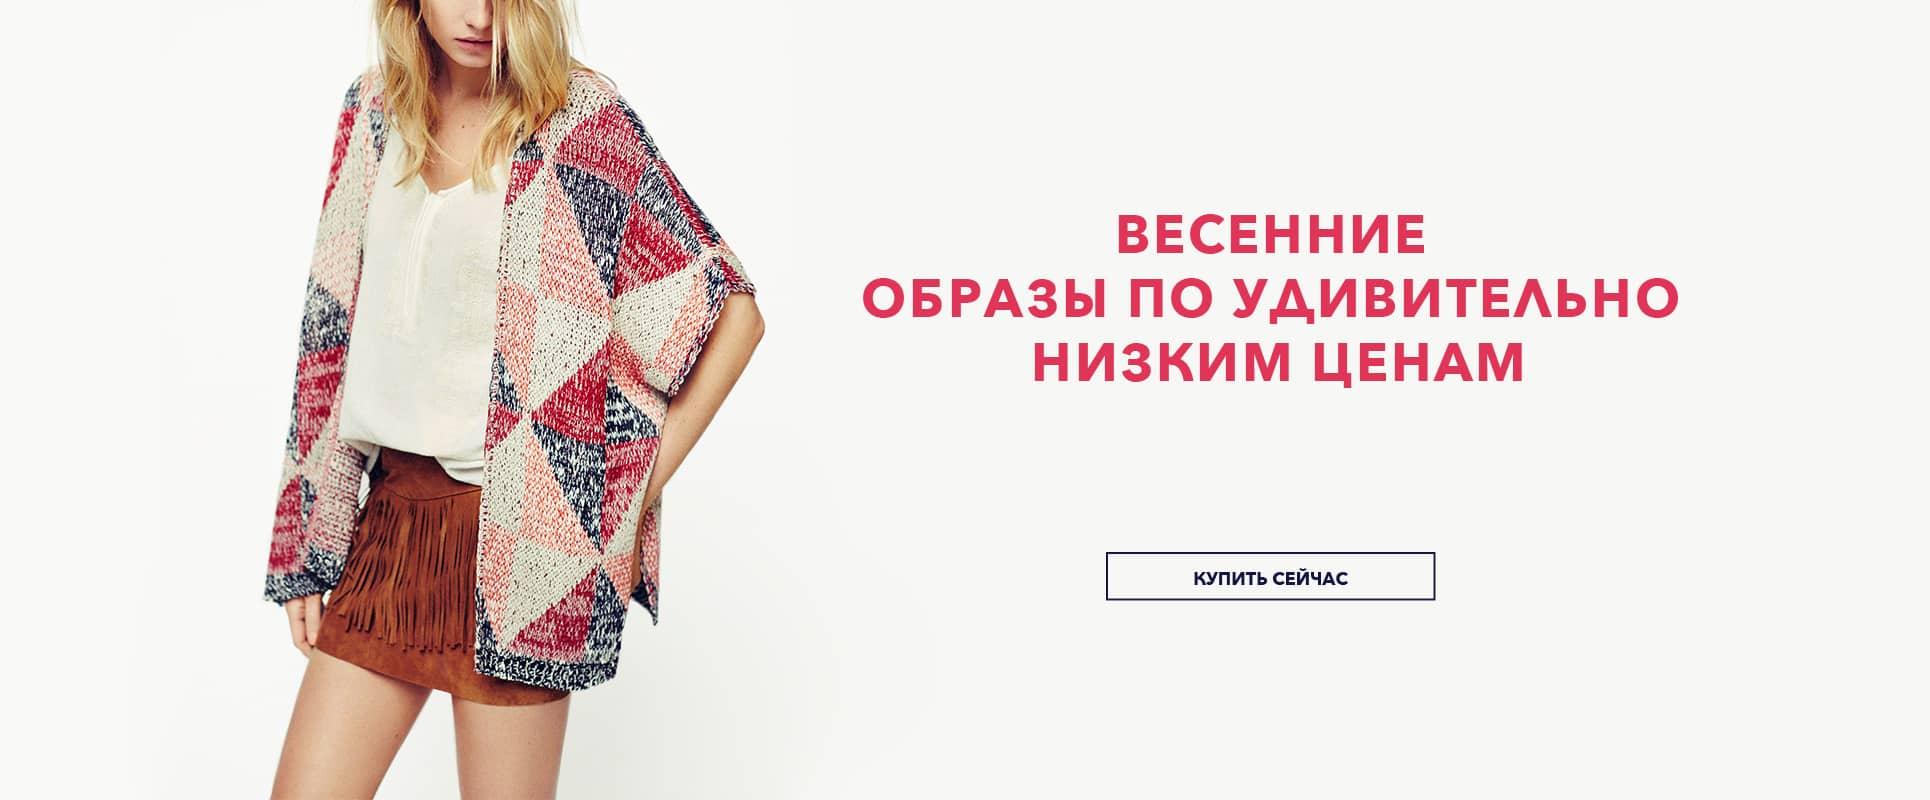 Одежда Манго Каталог